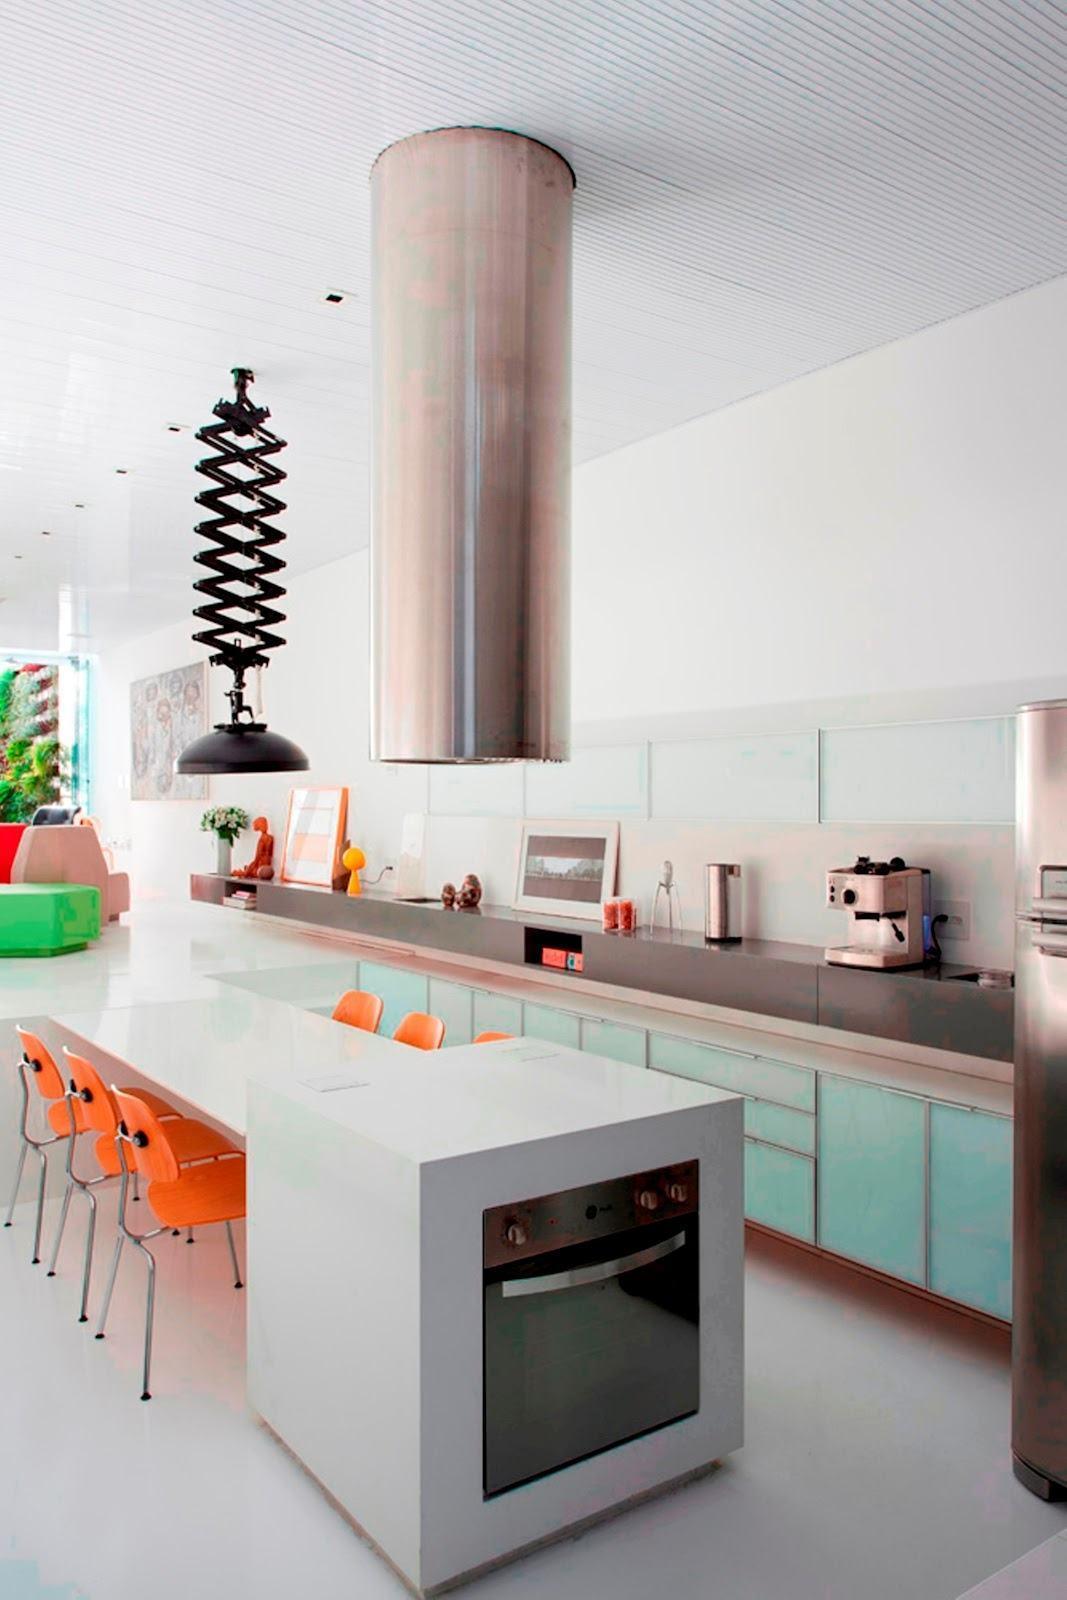 Porcelanato l quido o que como faz fotos e videos for Casas minimalistas pequenas interiores